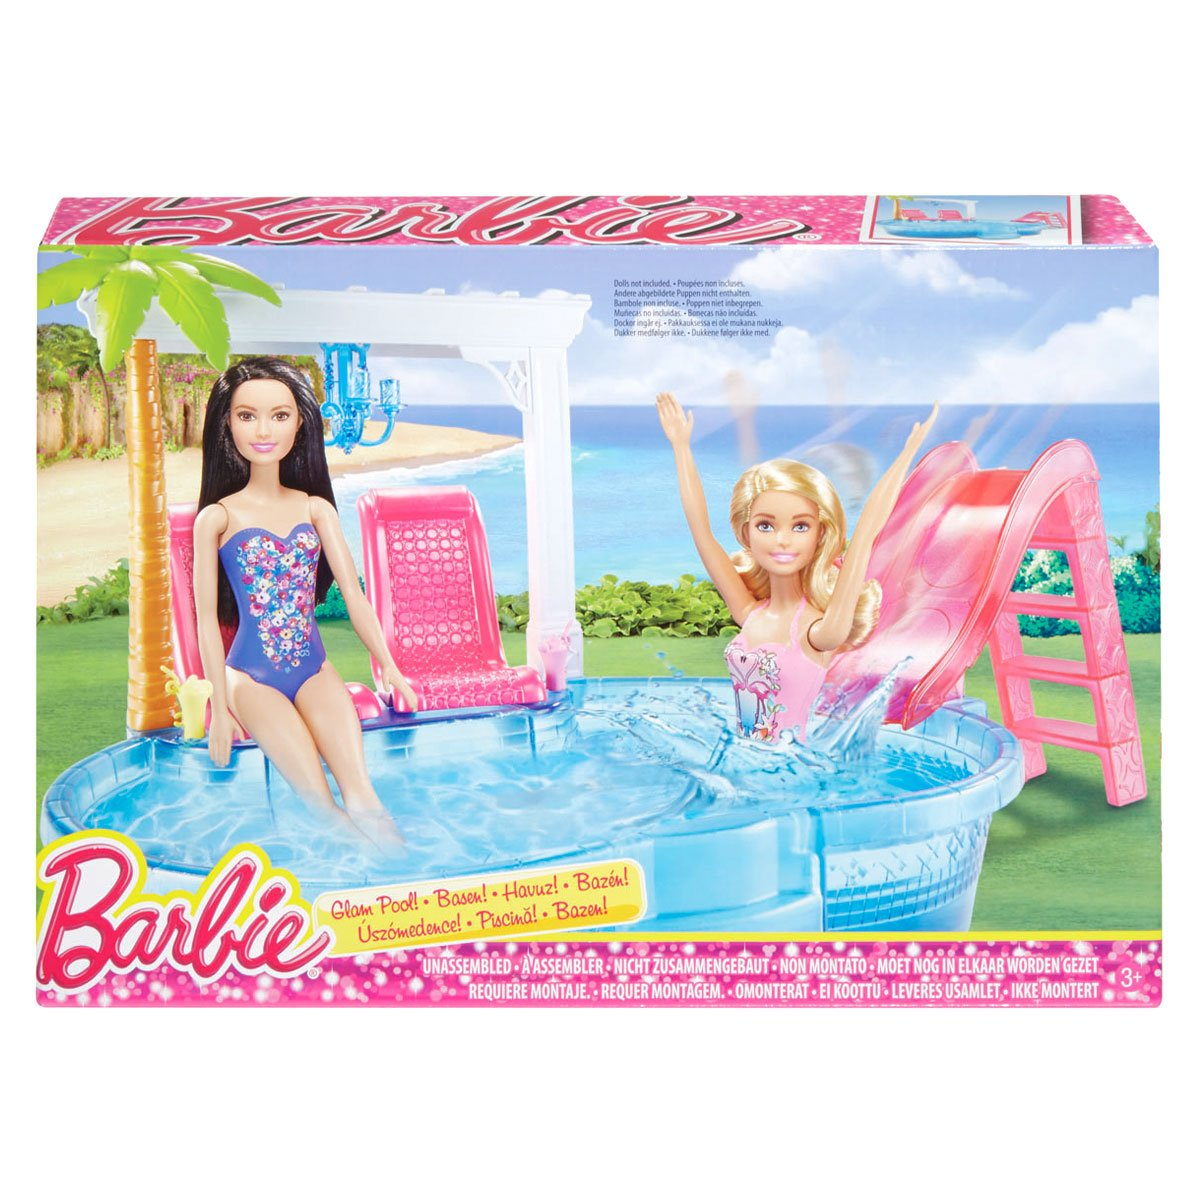 Barbie piscina glam sears com mx me entiende for Llenar piscina precio